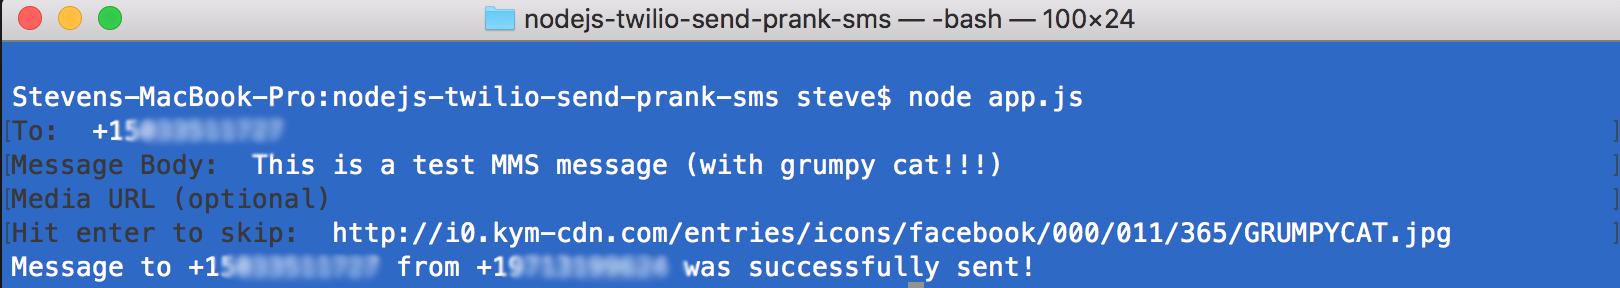 How To Send A Prank Text Message with Node js and Twilio API